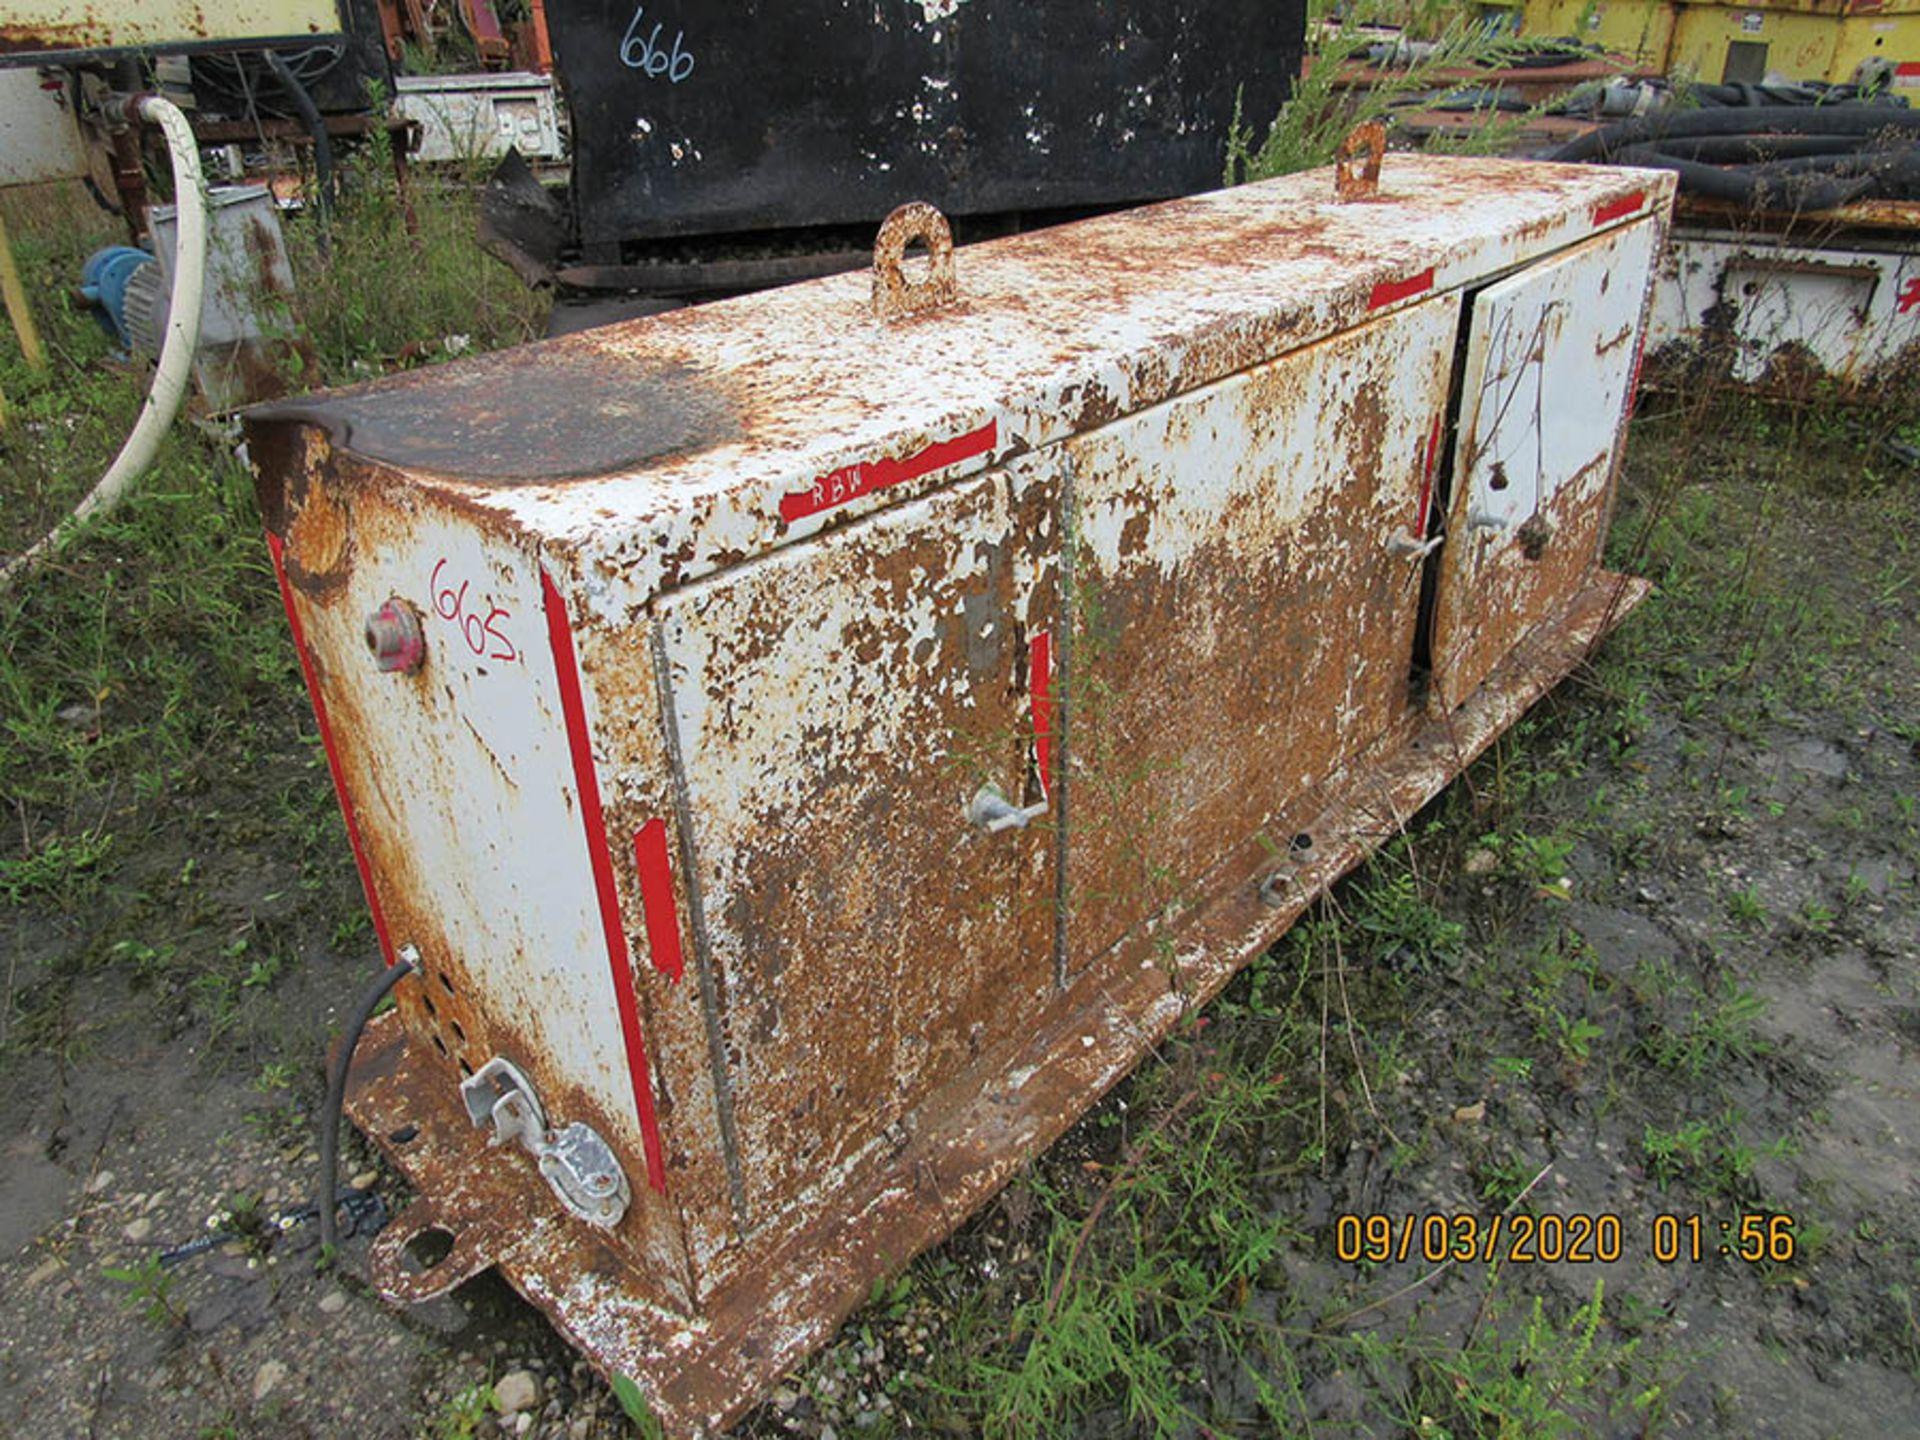 Lot 665 - MINING RESISTOR BOX